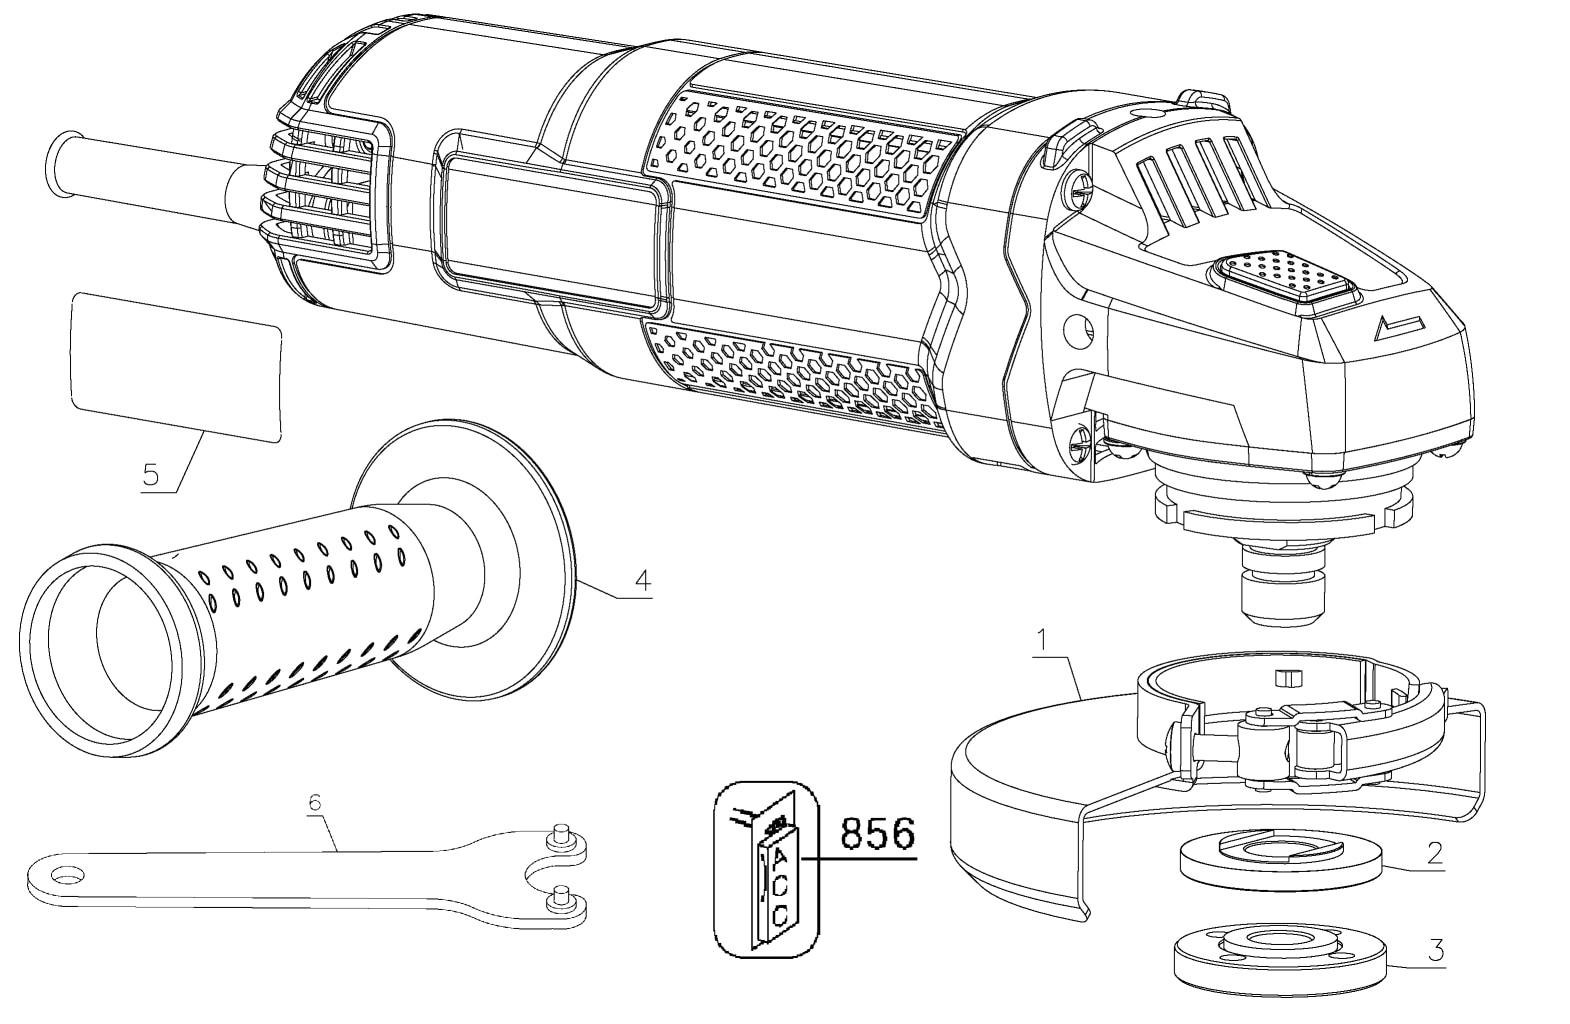 black & decker bdeg400 angle grinder parts